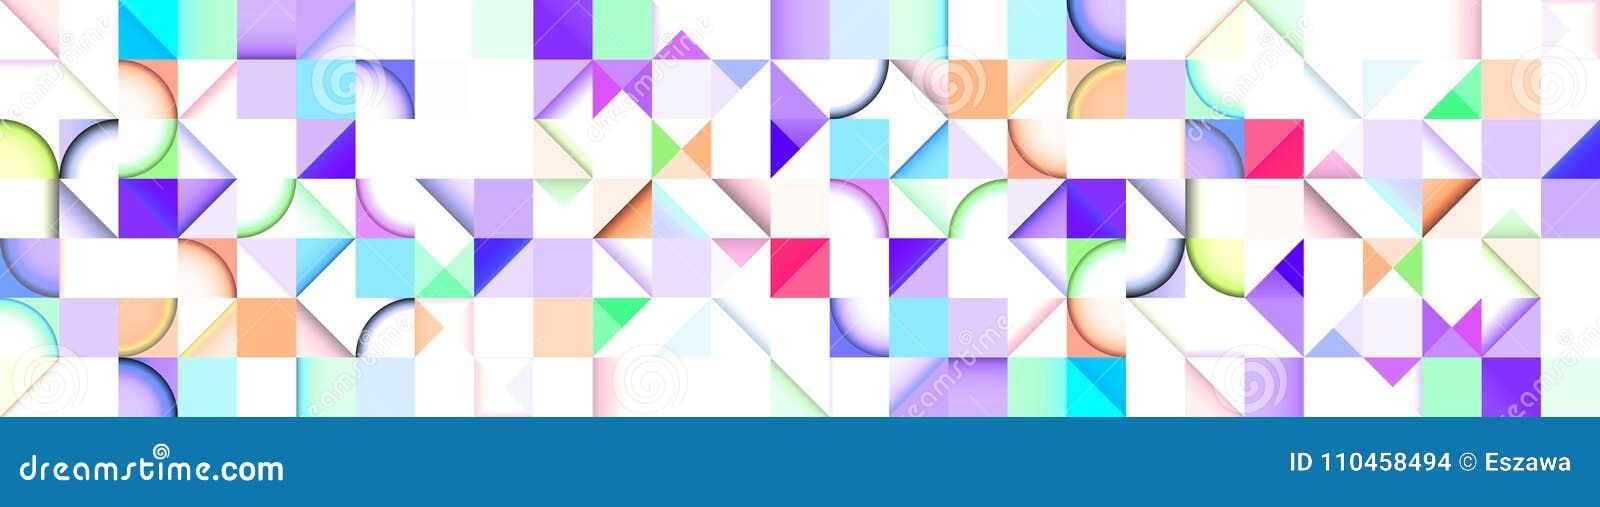 Abstrakt baner, Bitmap, frambragd dator